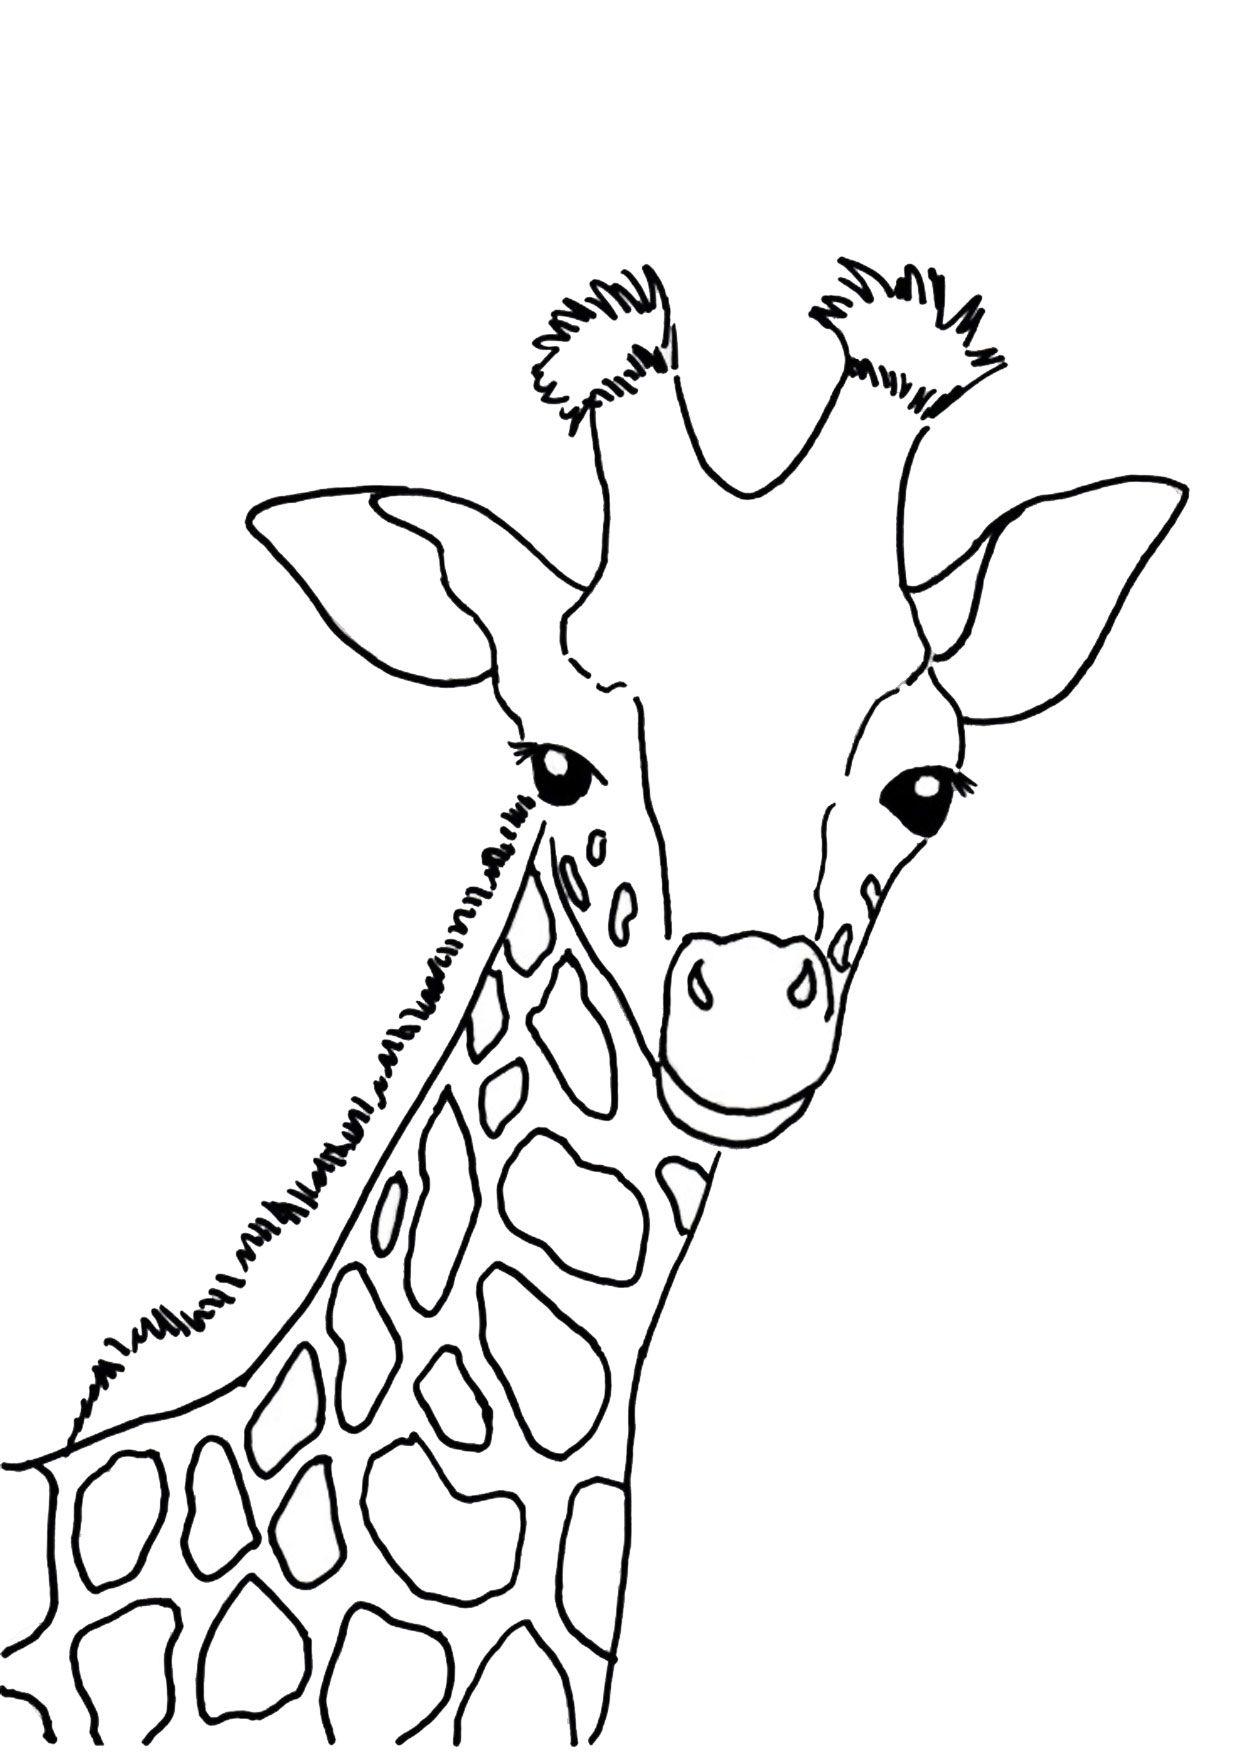 30 Disegni Di Giraffe Da Colorare Giraffe Drawing Cartoon